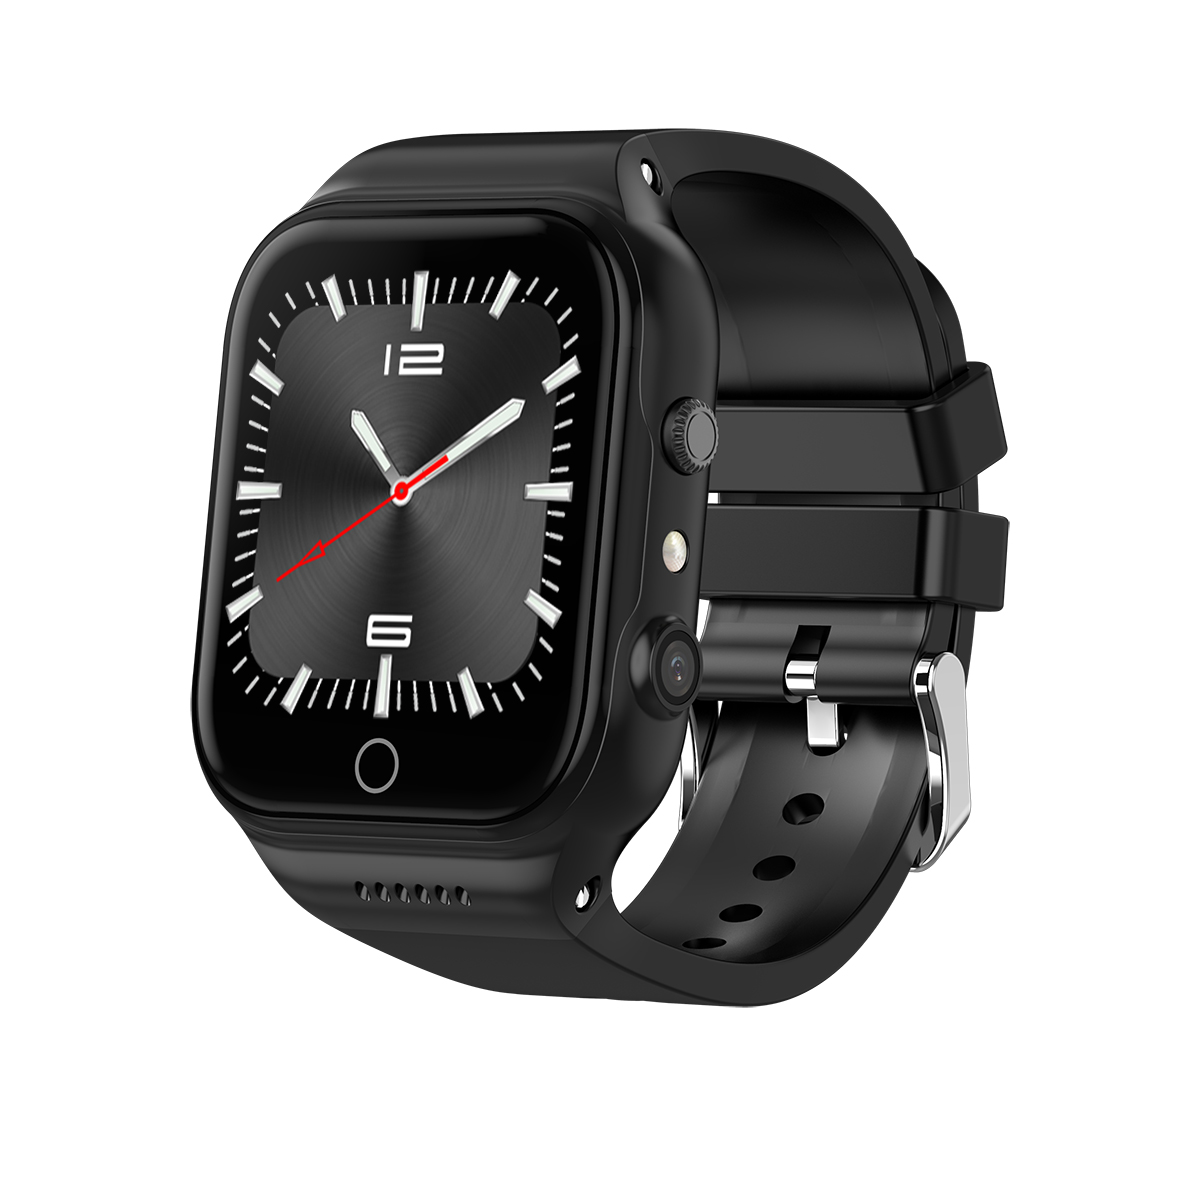 Smart Watch With Camera Bluetooth Wrist Watch SIM X89 Smartwatch Android 5.1 Rom Wifi 8G Mini Cam Smart Electronics GPS Watches